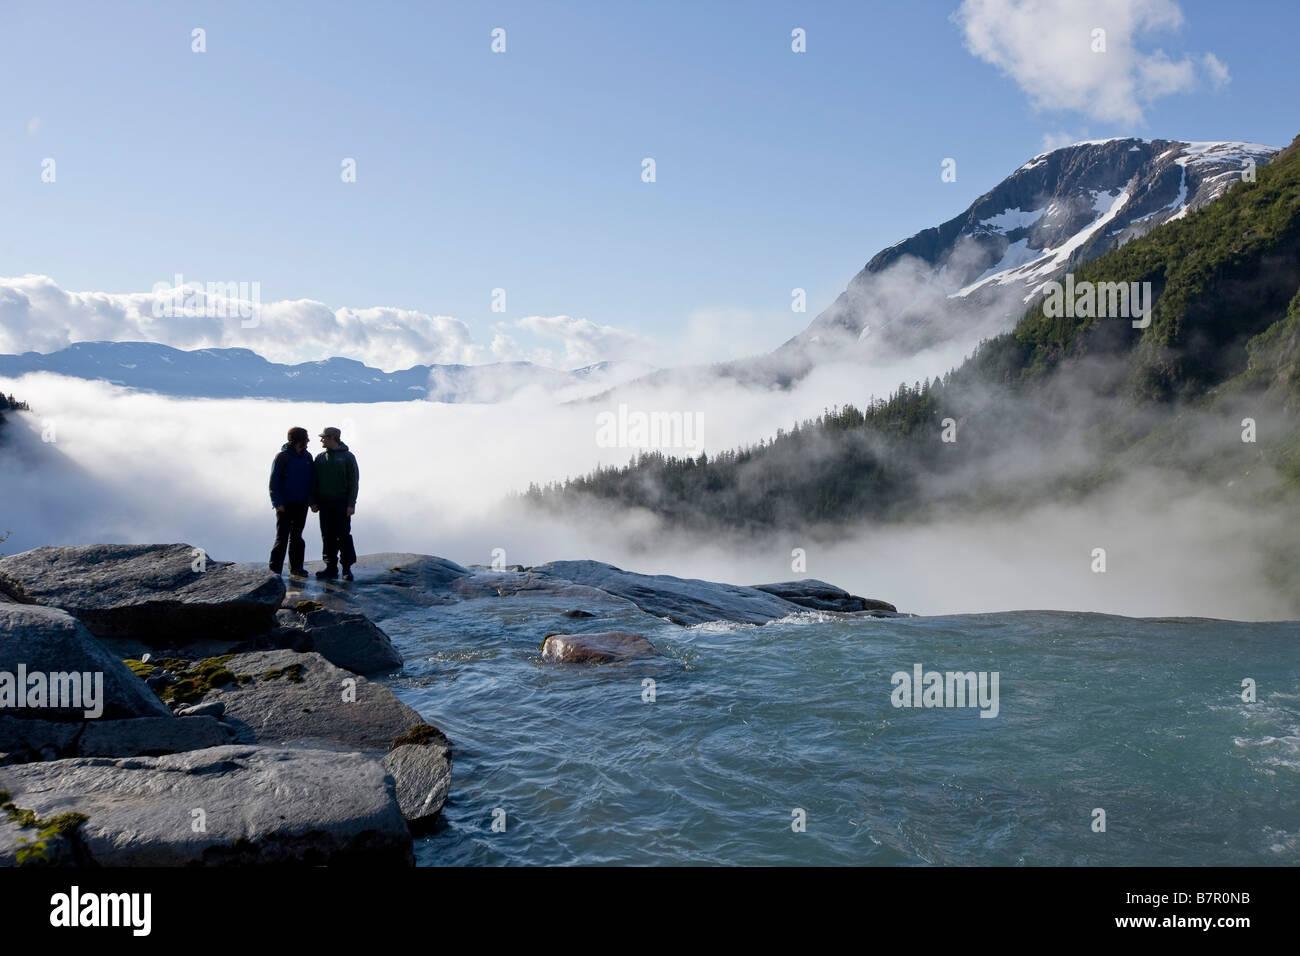 Two people overlook the brink of Sockeye Falls originating in the Juneau Icefield, Taku River Valley below in Southeast - Stock Image